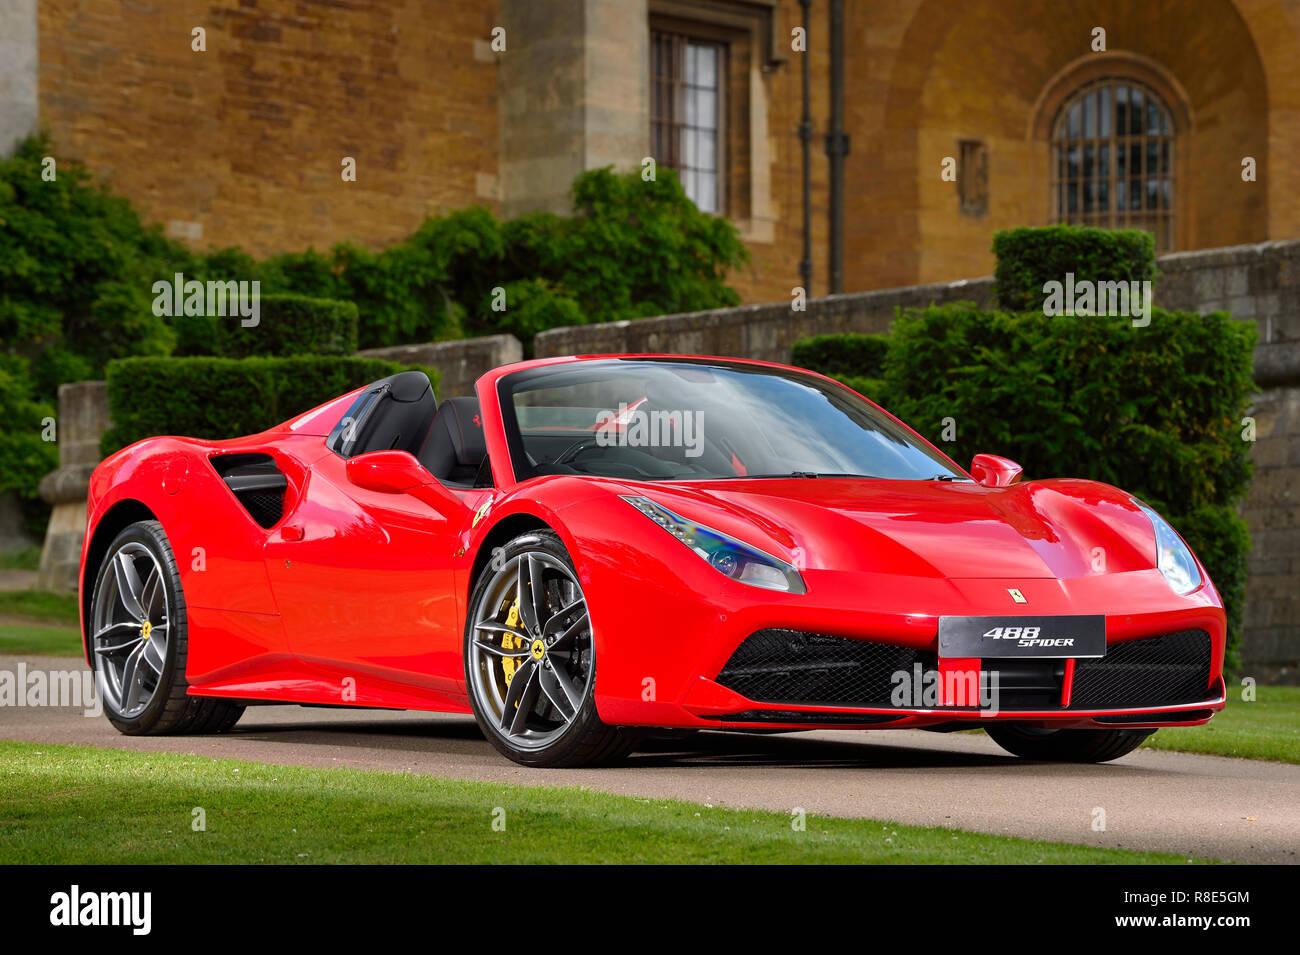 Rojo Ferrari 488 Spider Fotografia De Stock Alamy